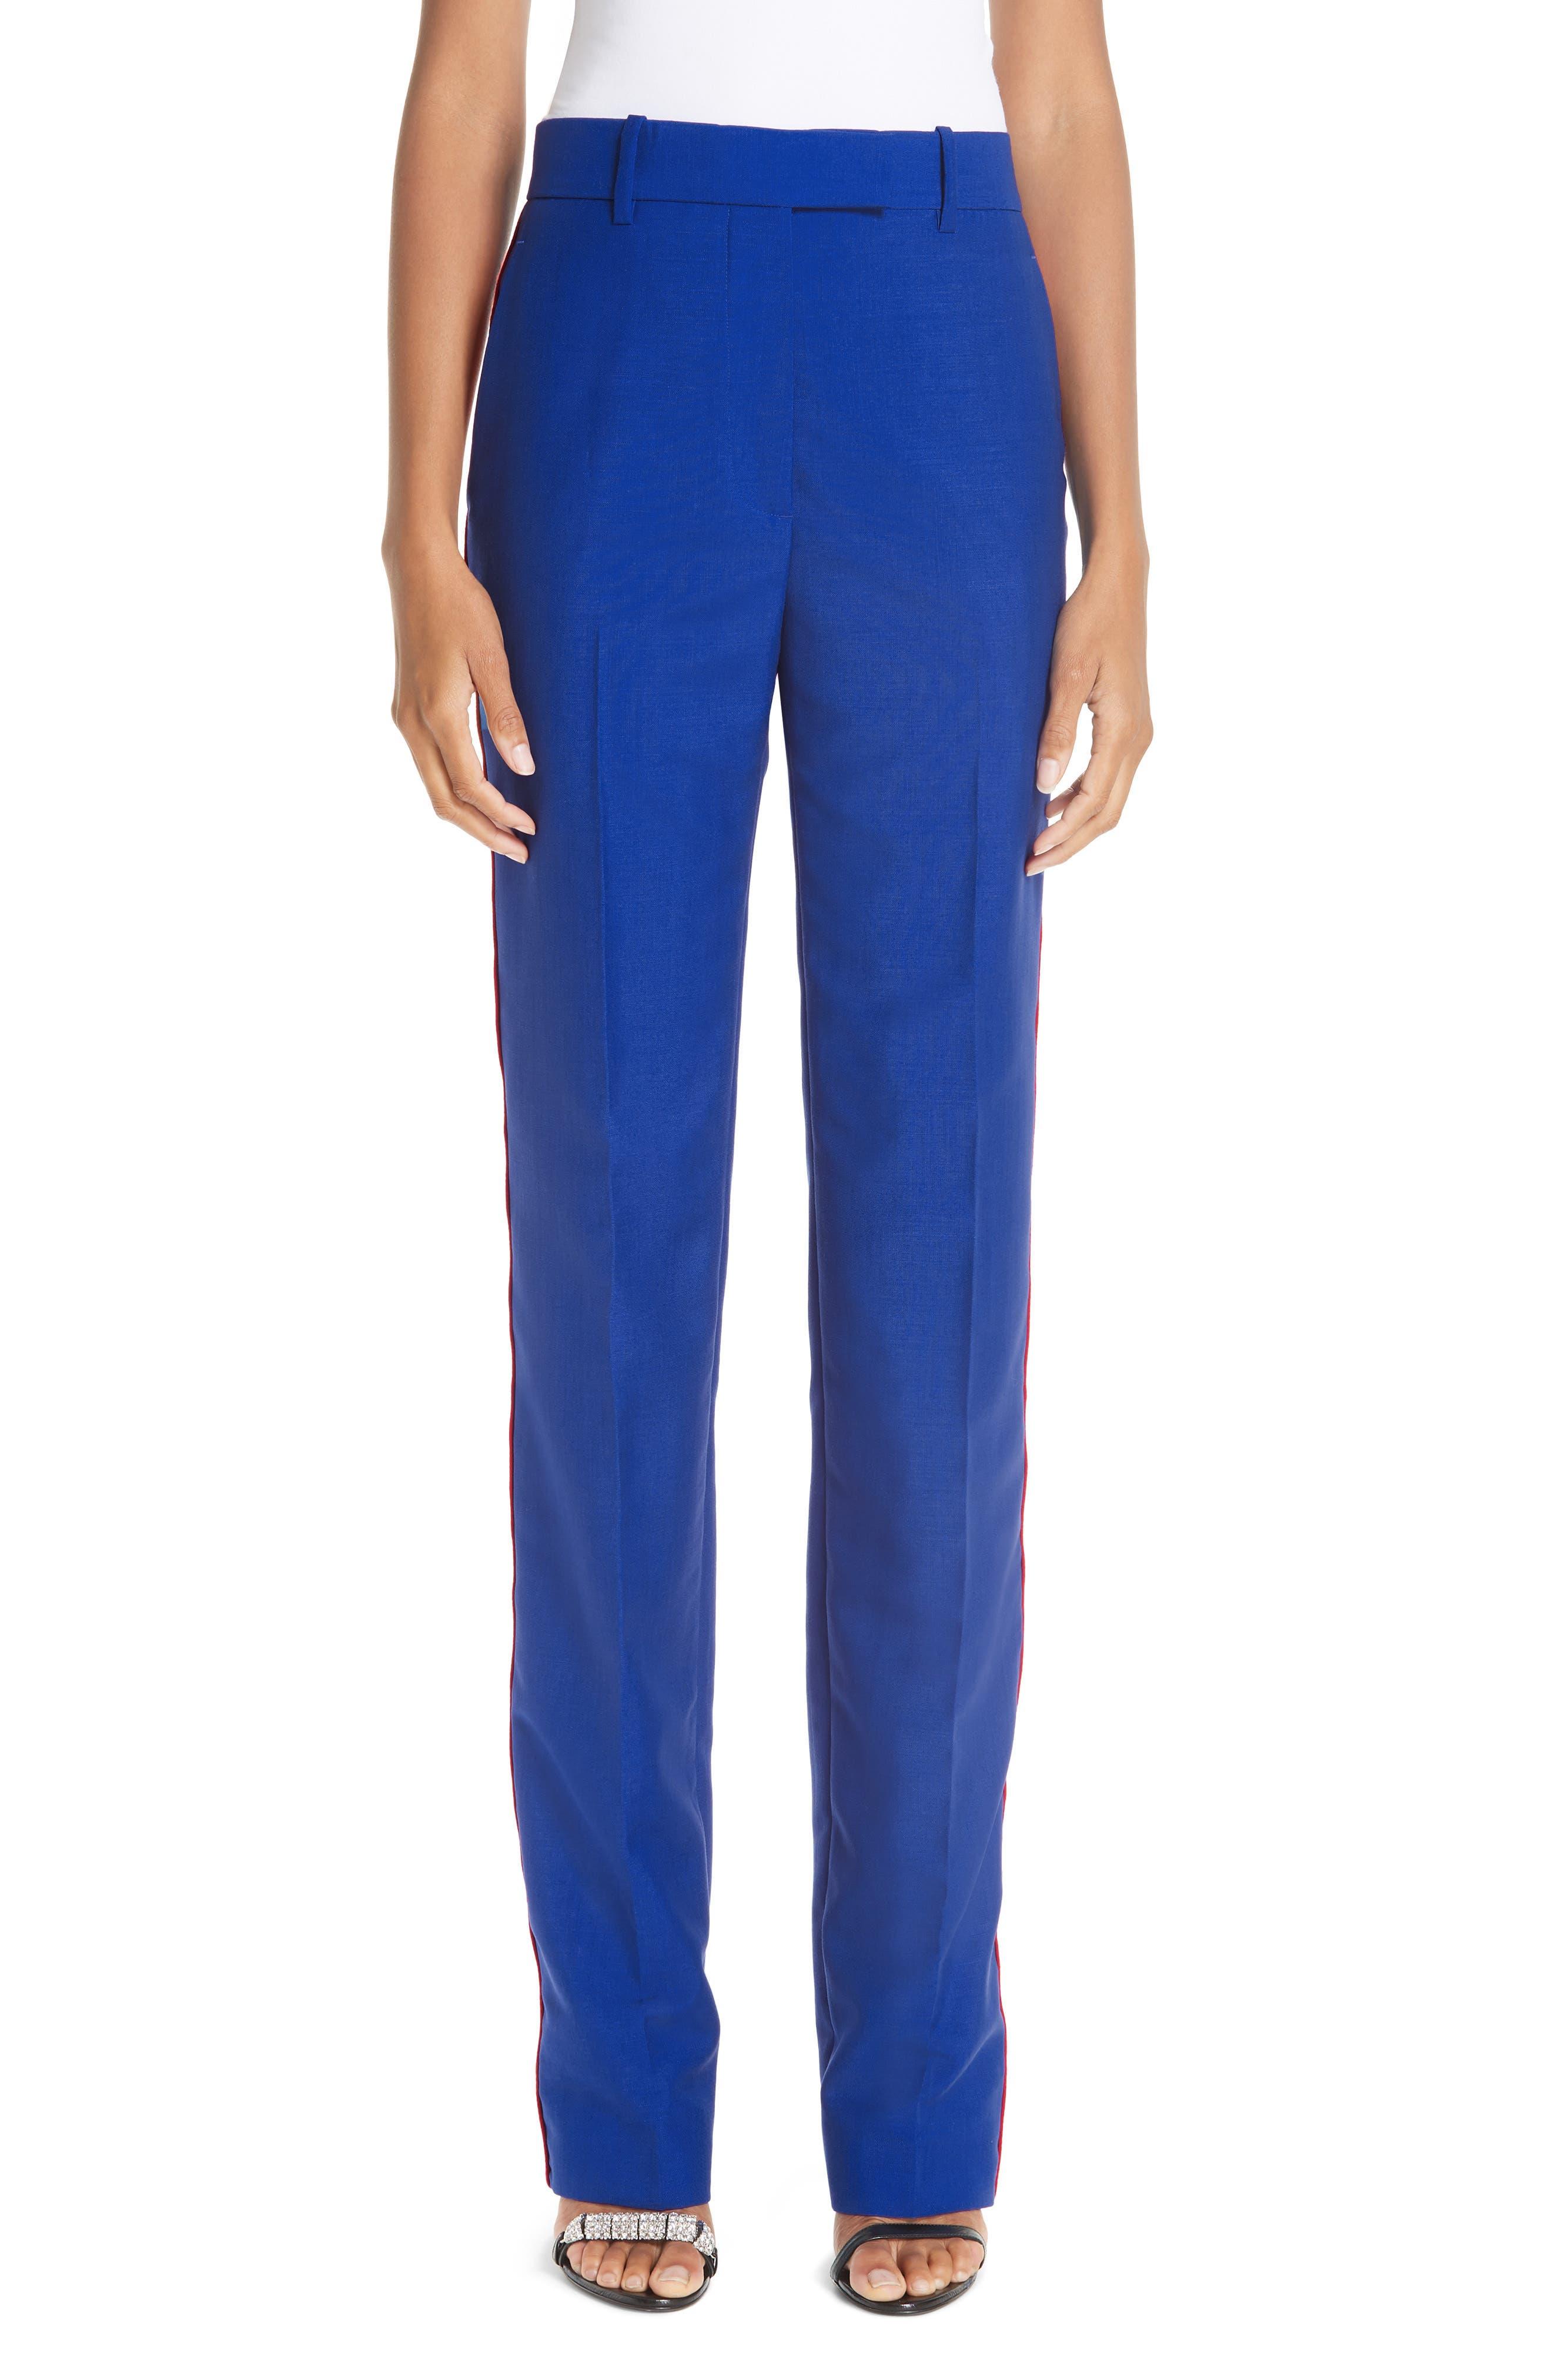 CALVIN KLEIN 205W39NYC, Side Stripe Mohair & Wool Straight Leg Pants, Main thumbnail 1, color, BRIGHT BLUE